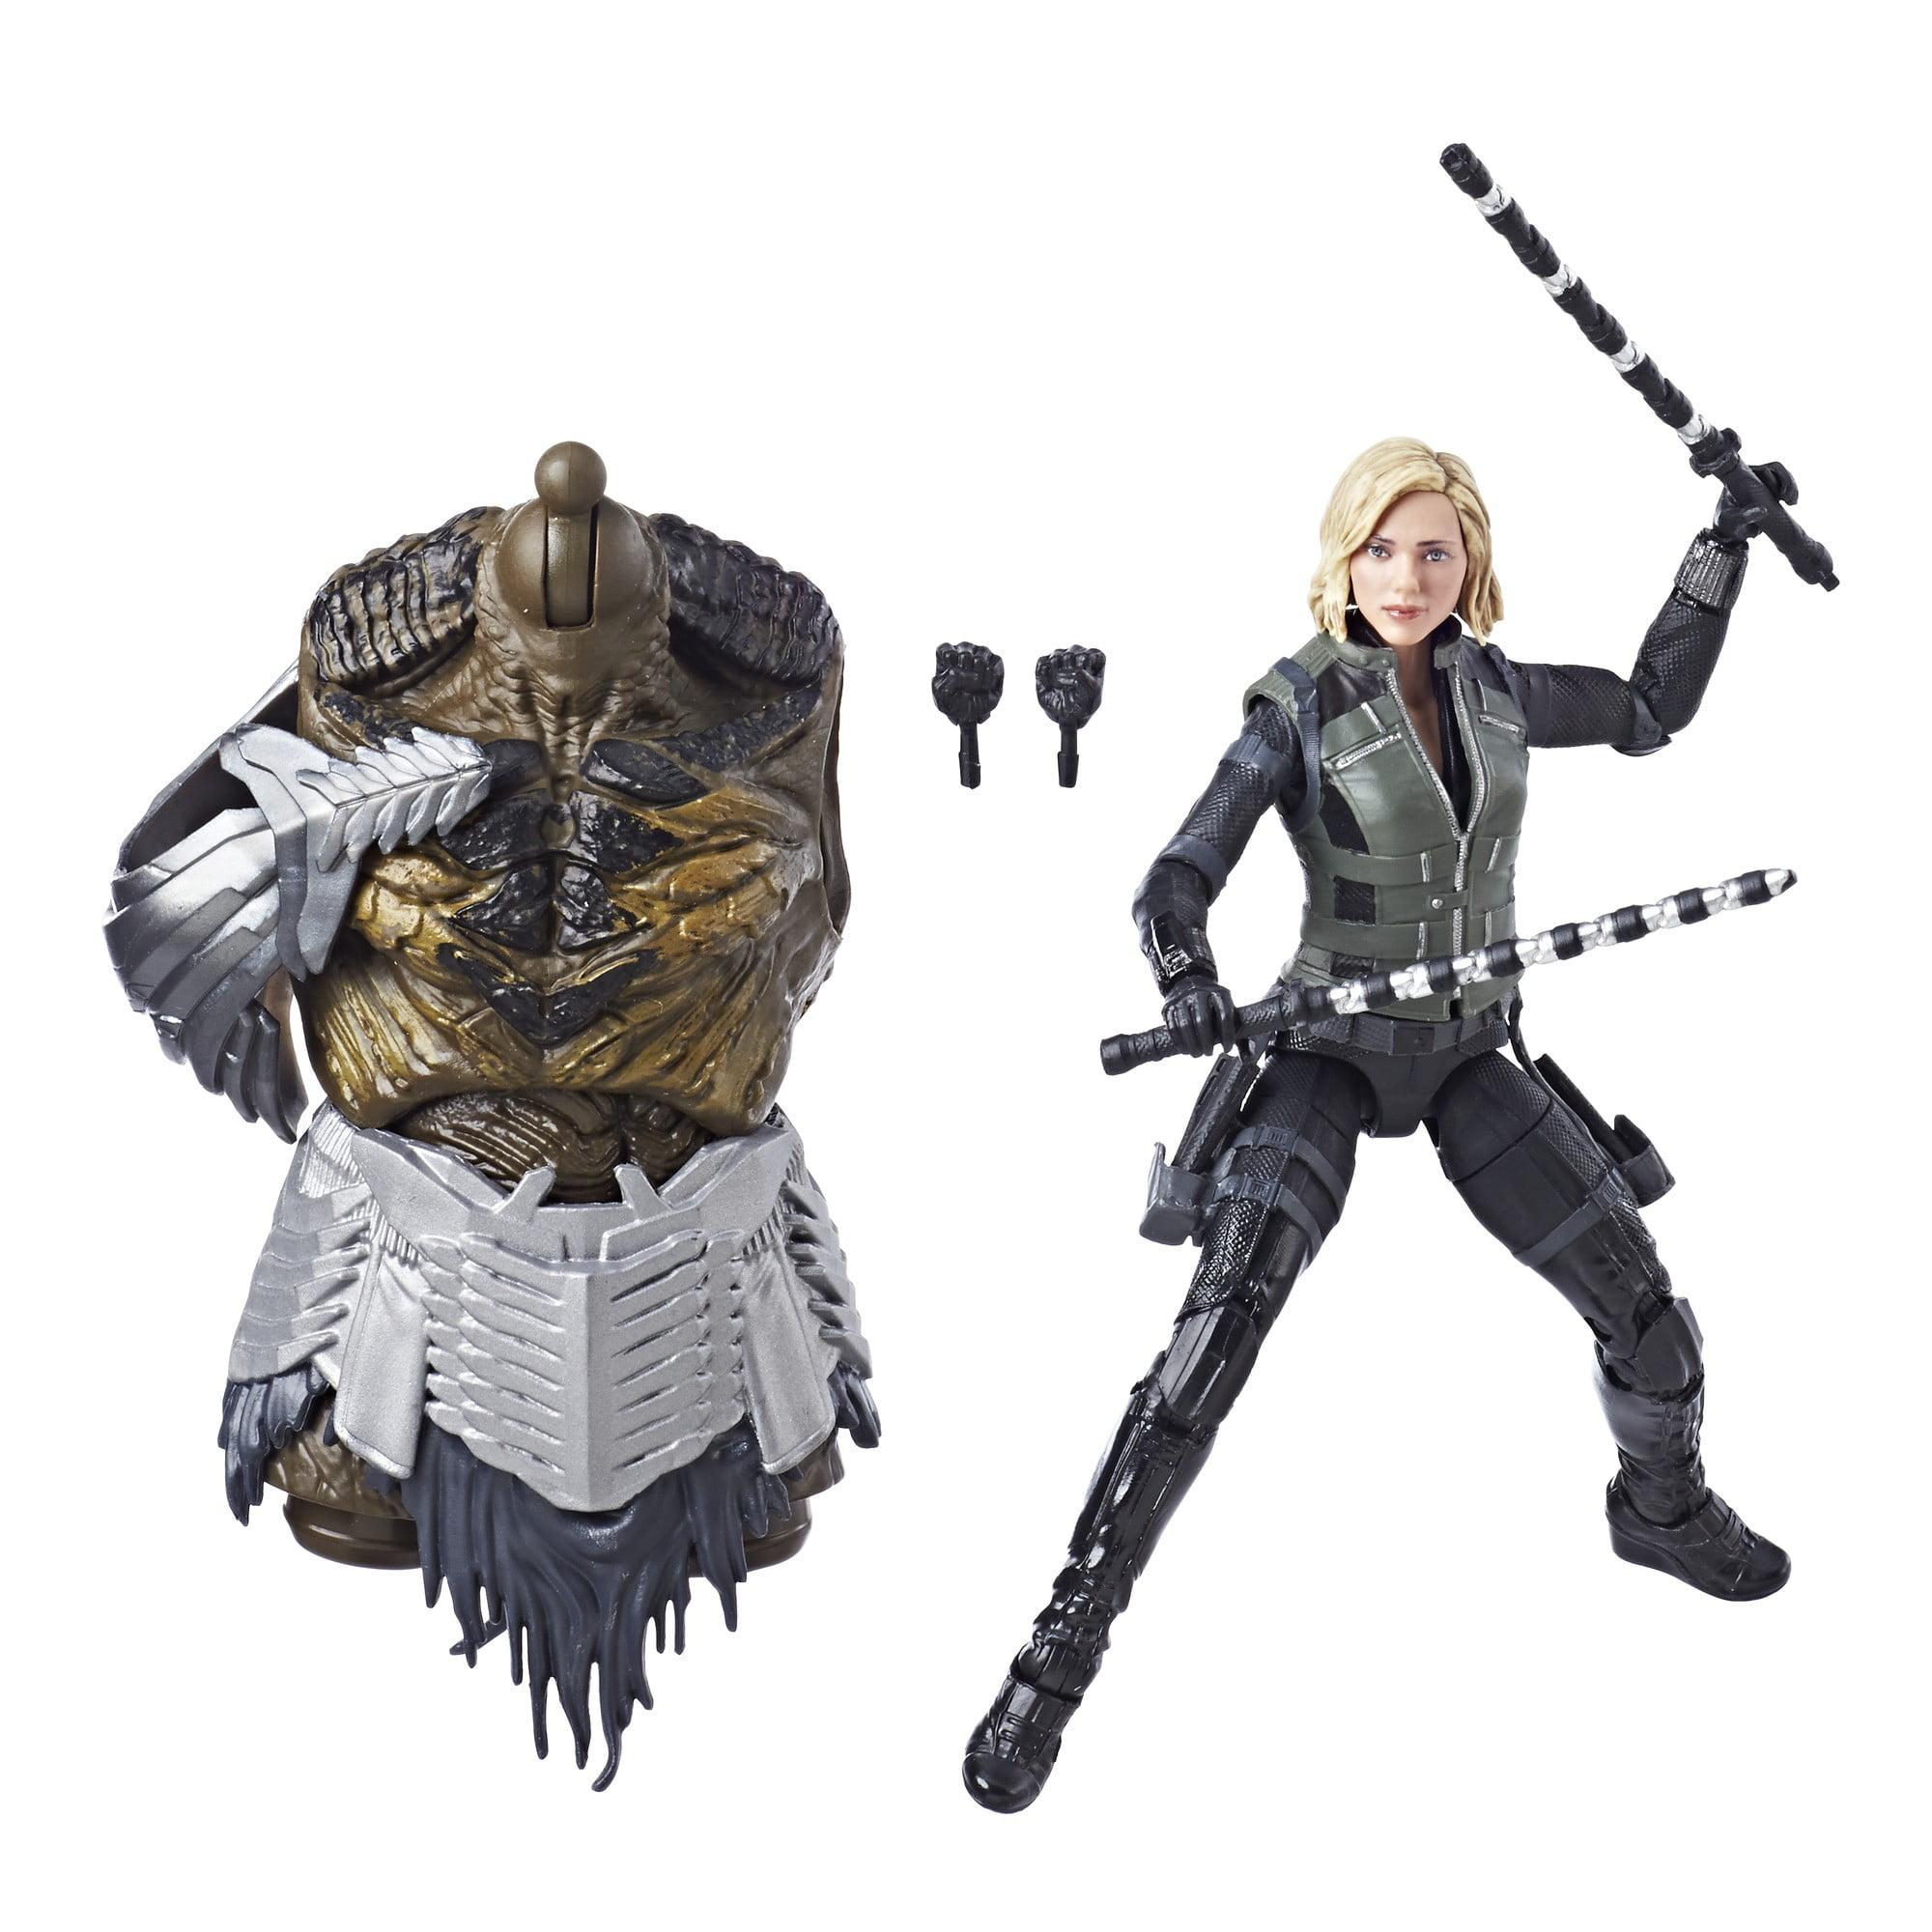 Avengers marvel legends series 6-inch black widow